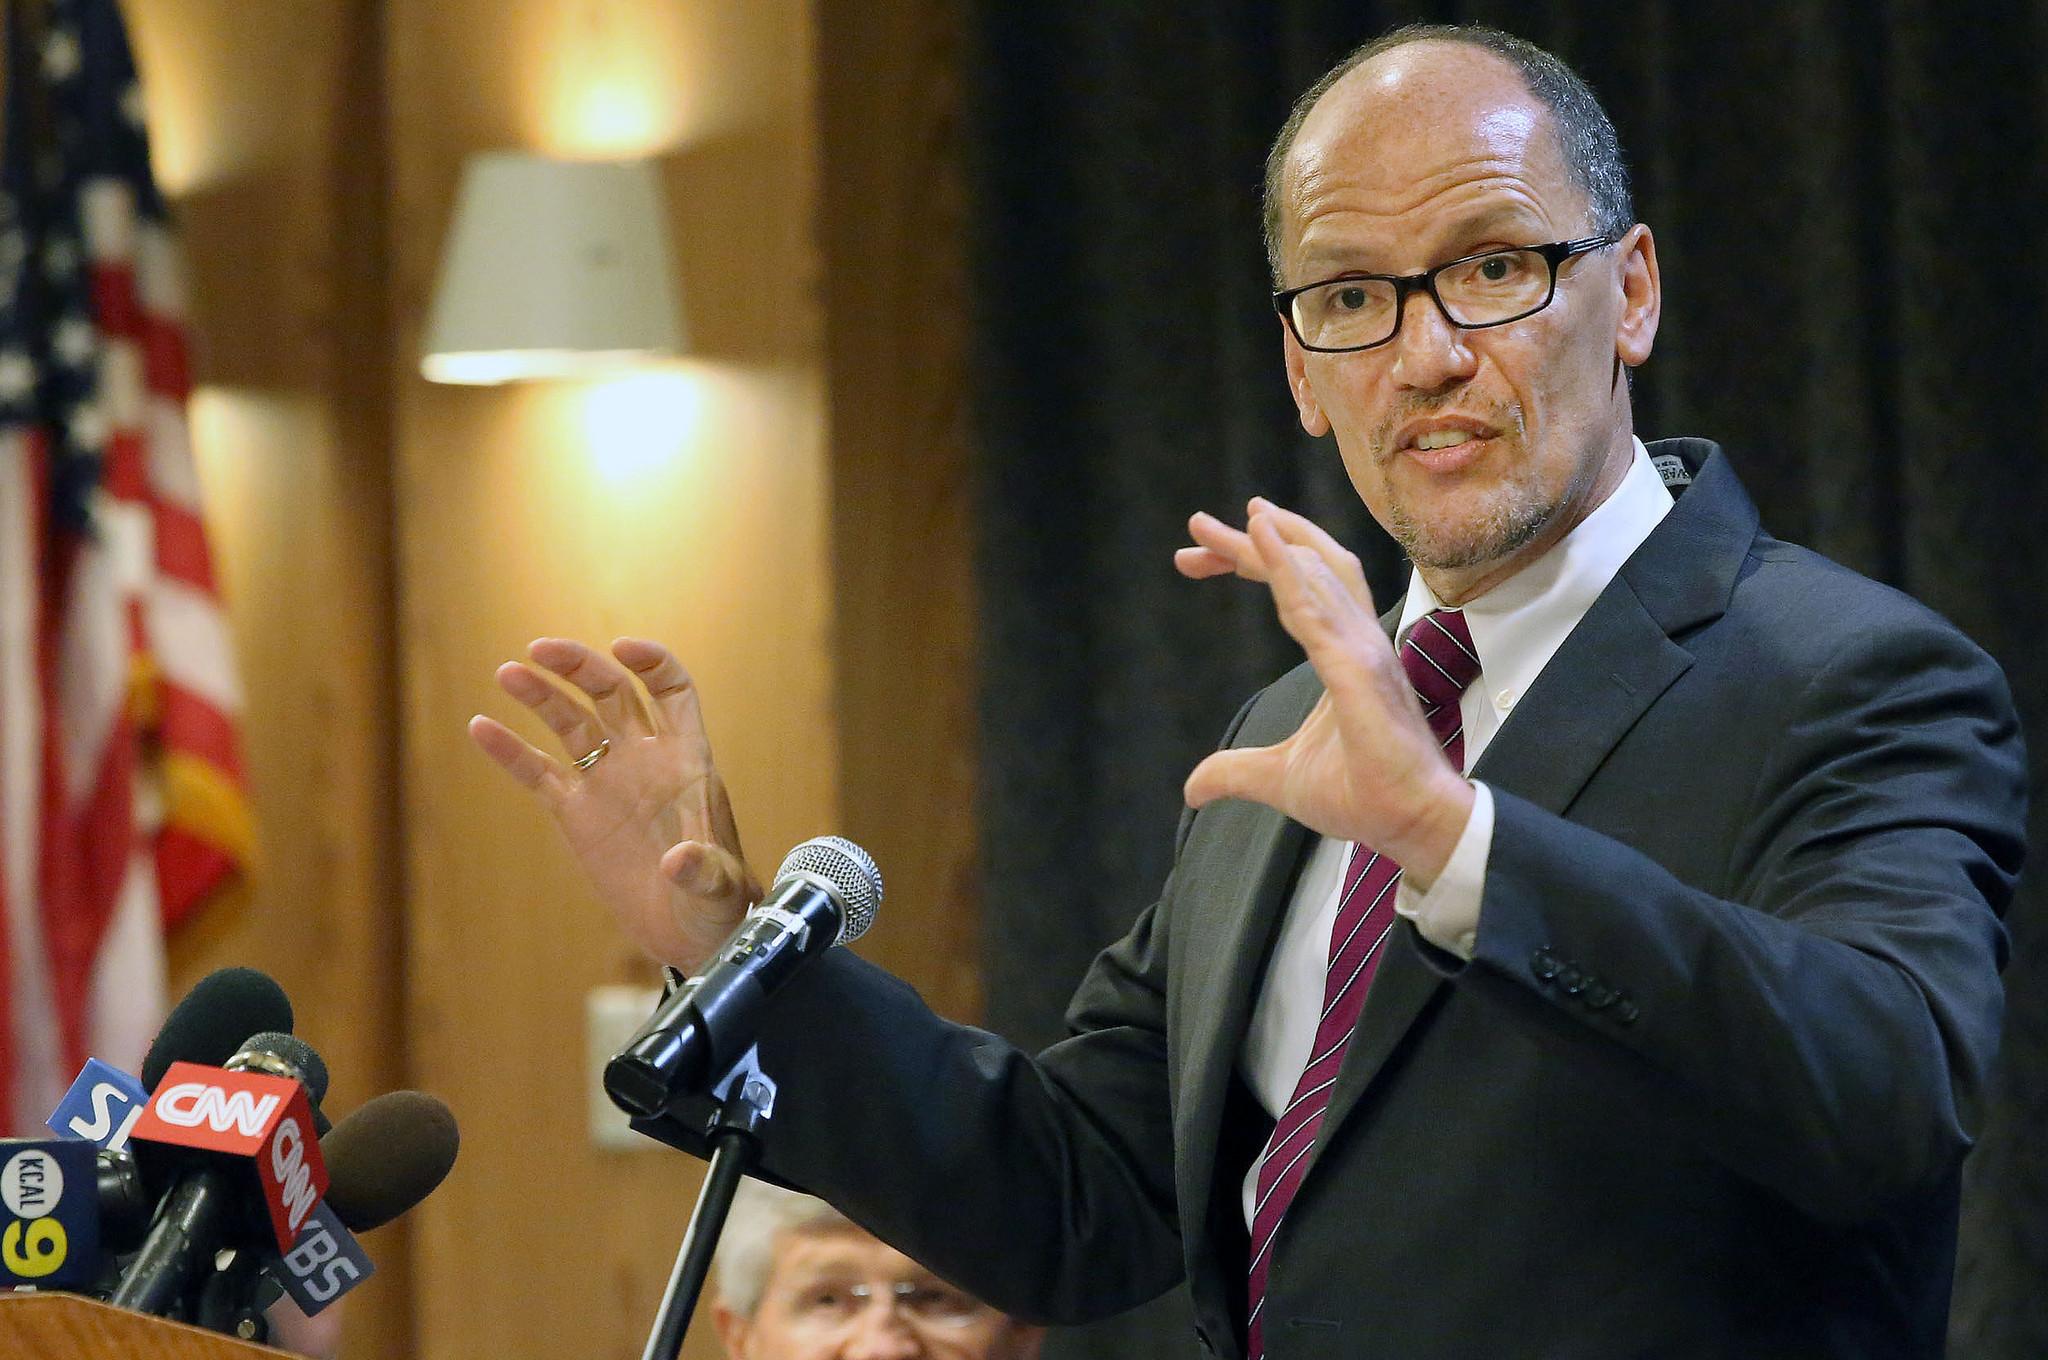 Secretary of Labor Thomas Perez comes to Los Angeles, talks minimum wage and manufacturing